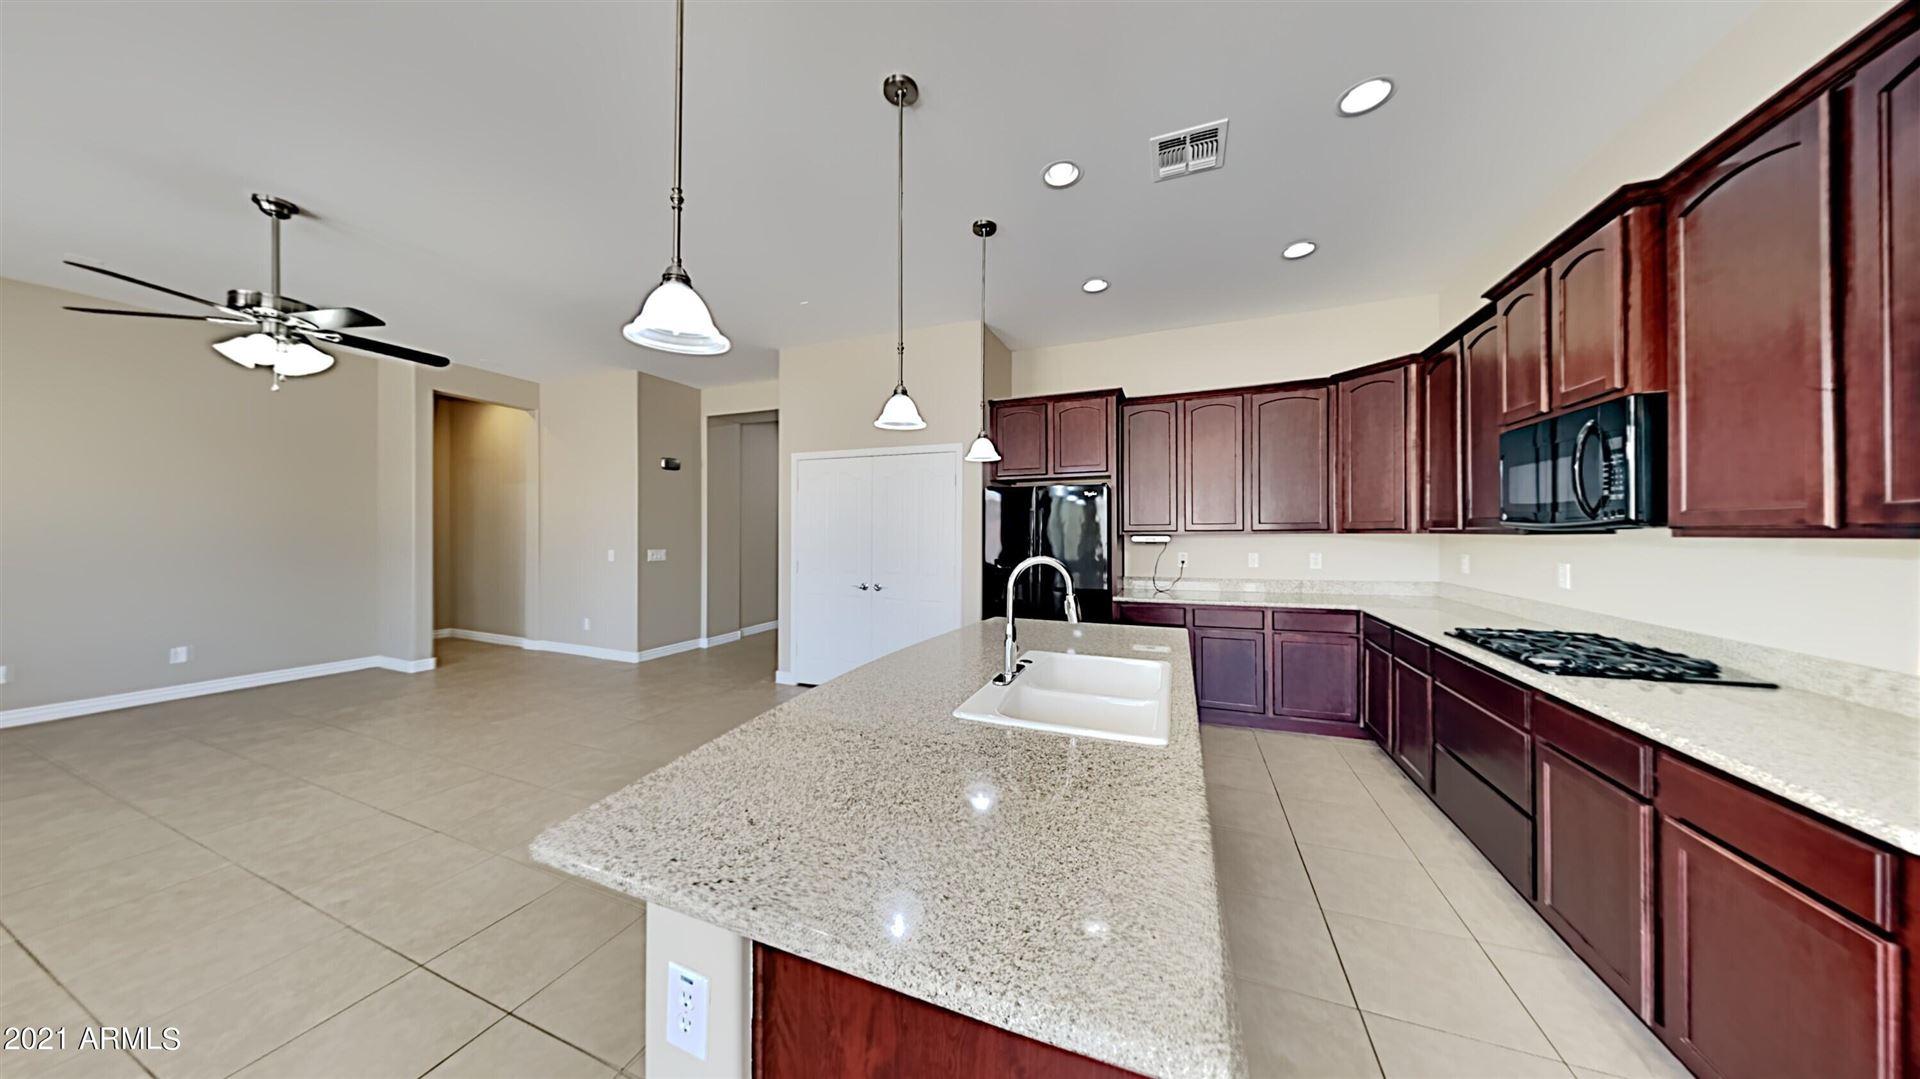 Photo of 13607 S 176TH Drive, Goodyear, AZ 85338 (MLS # 6248357)